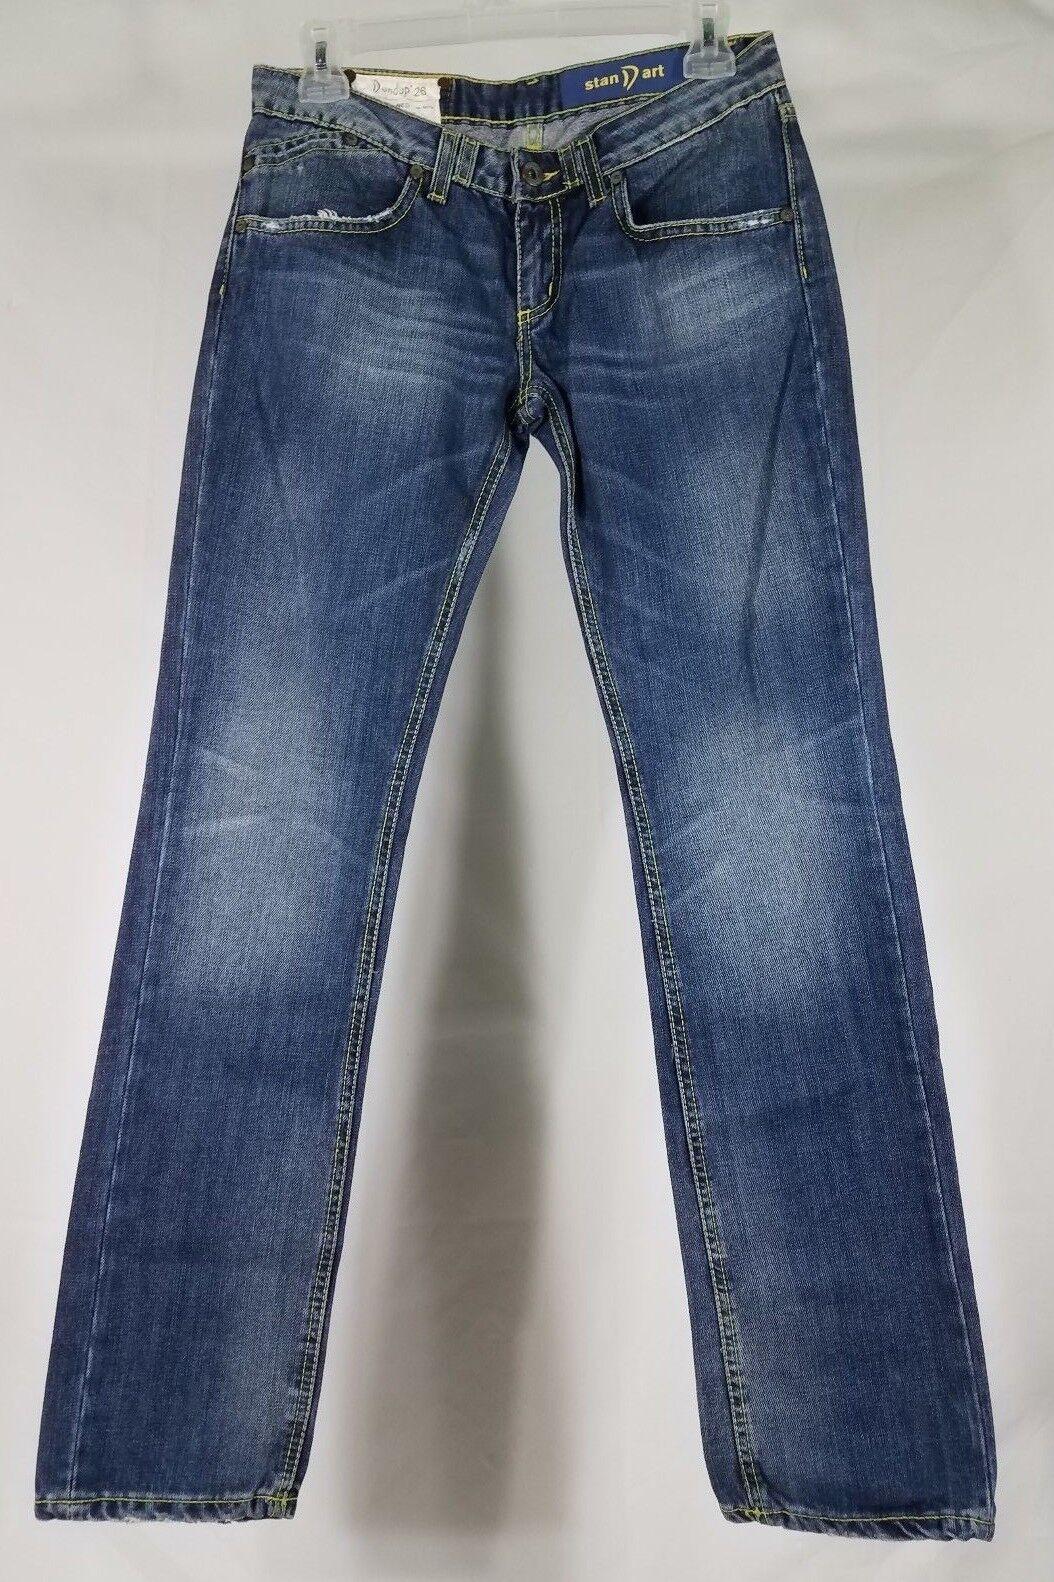 Dondup Standart distressed straight slim cotton denim bluee jeans ladies 26